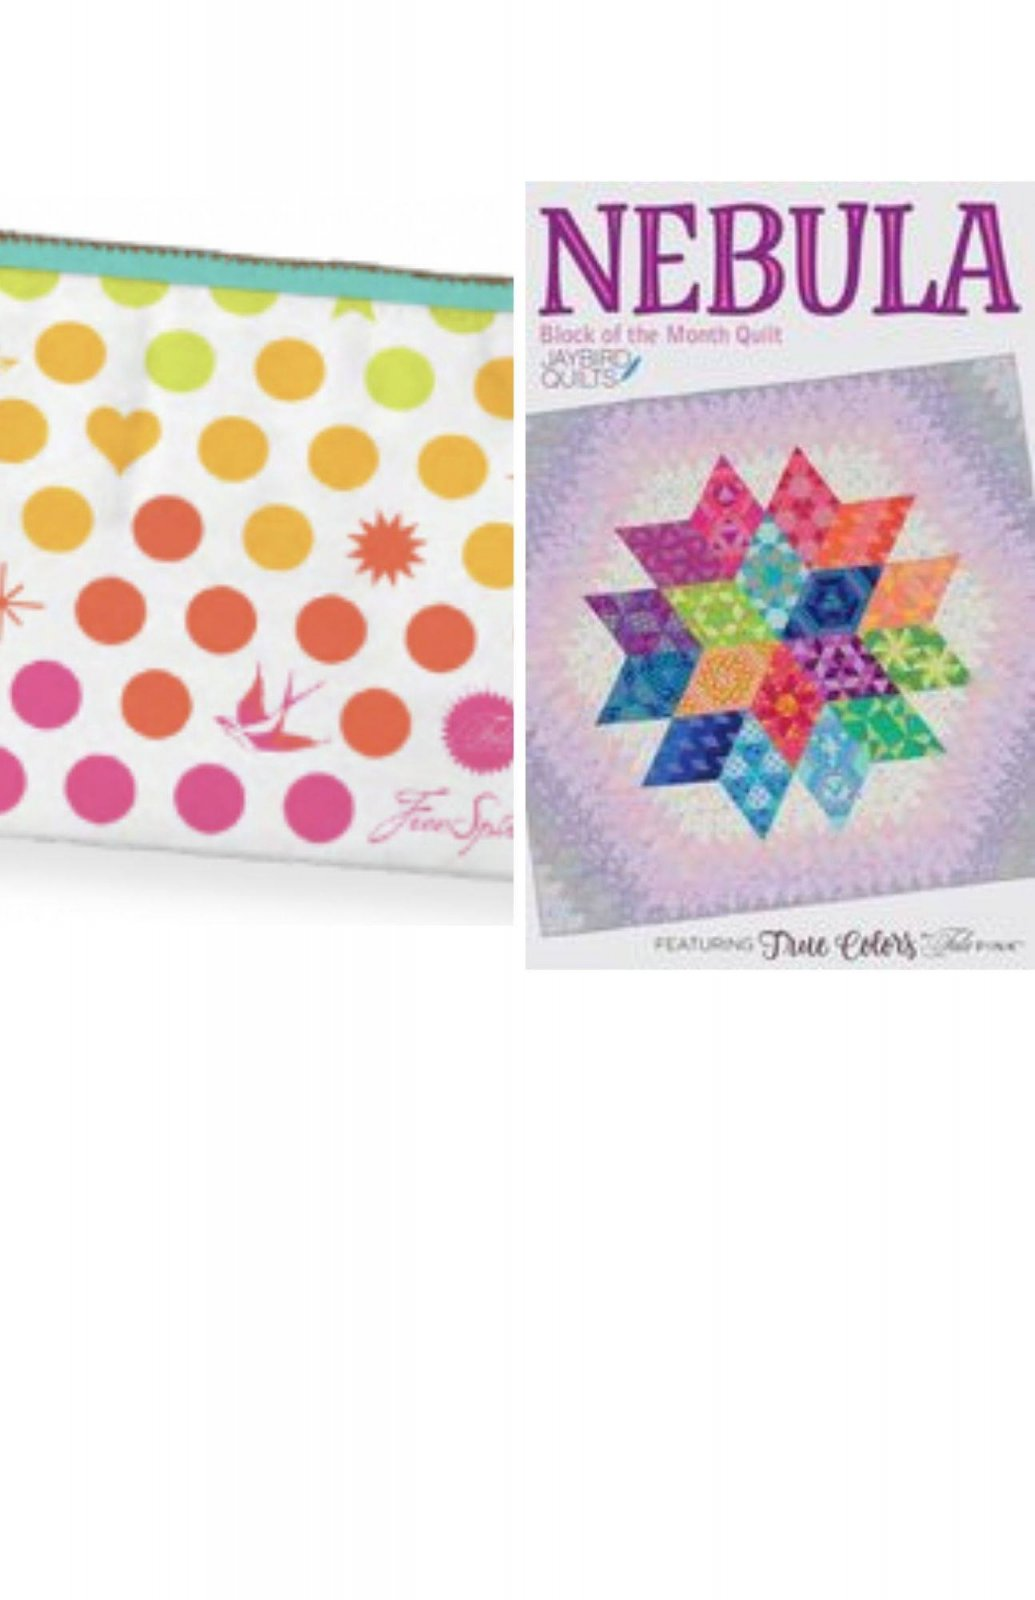 Nebula BOM includes SWAG! Kit 11